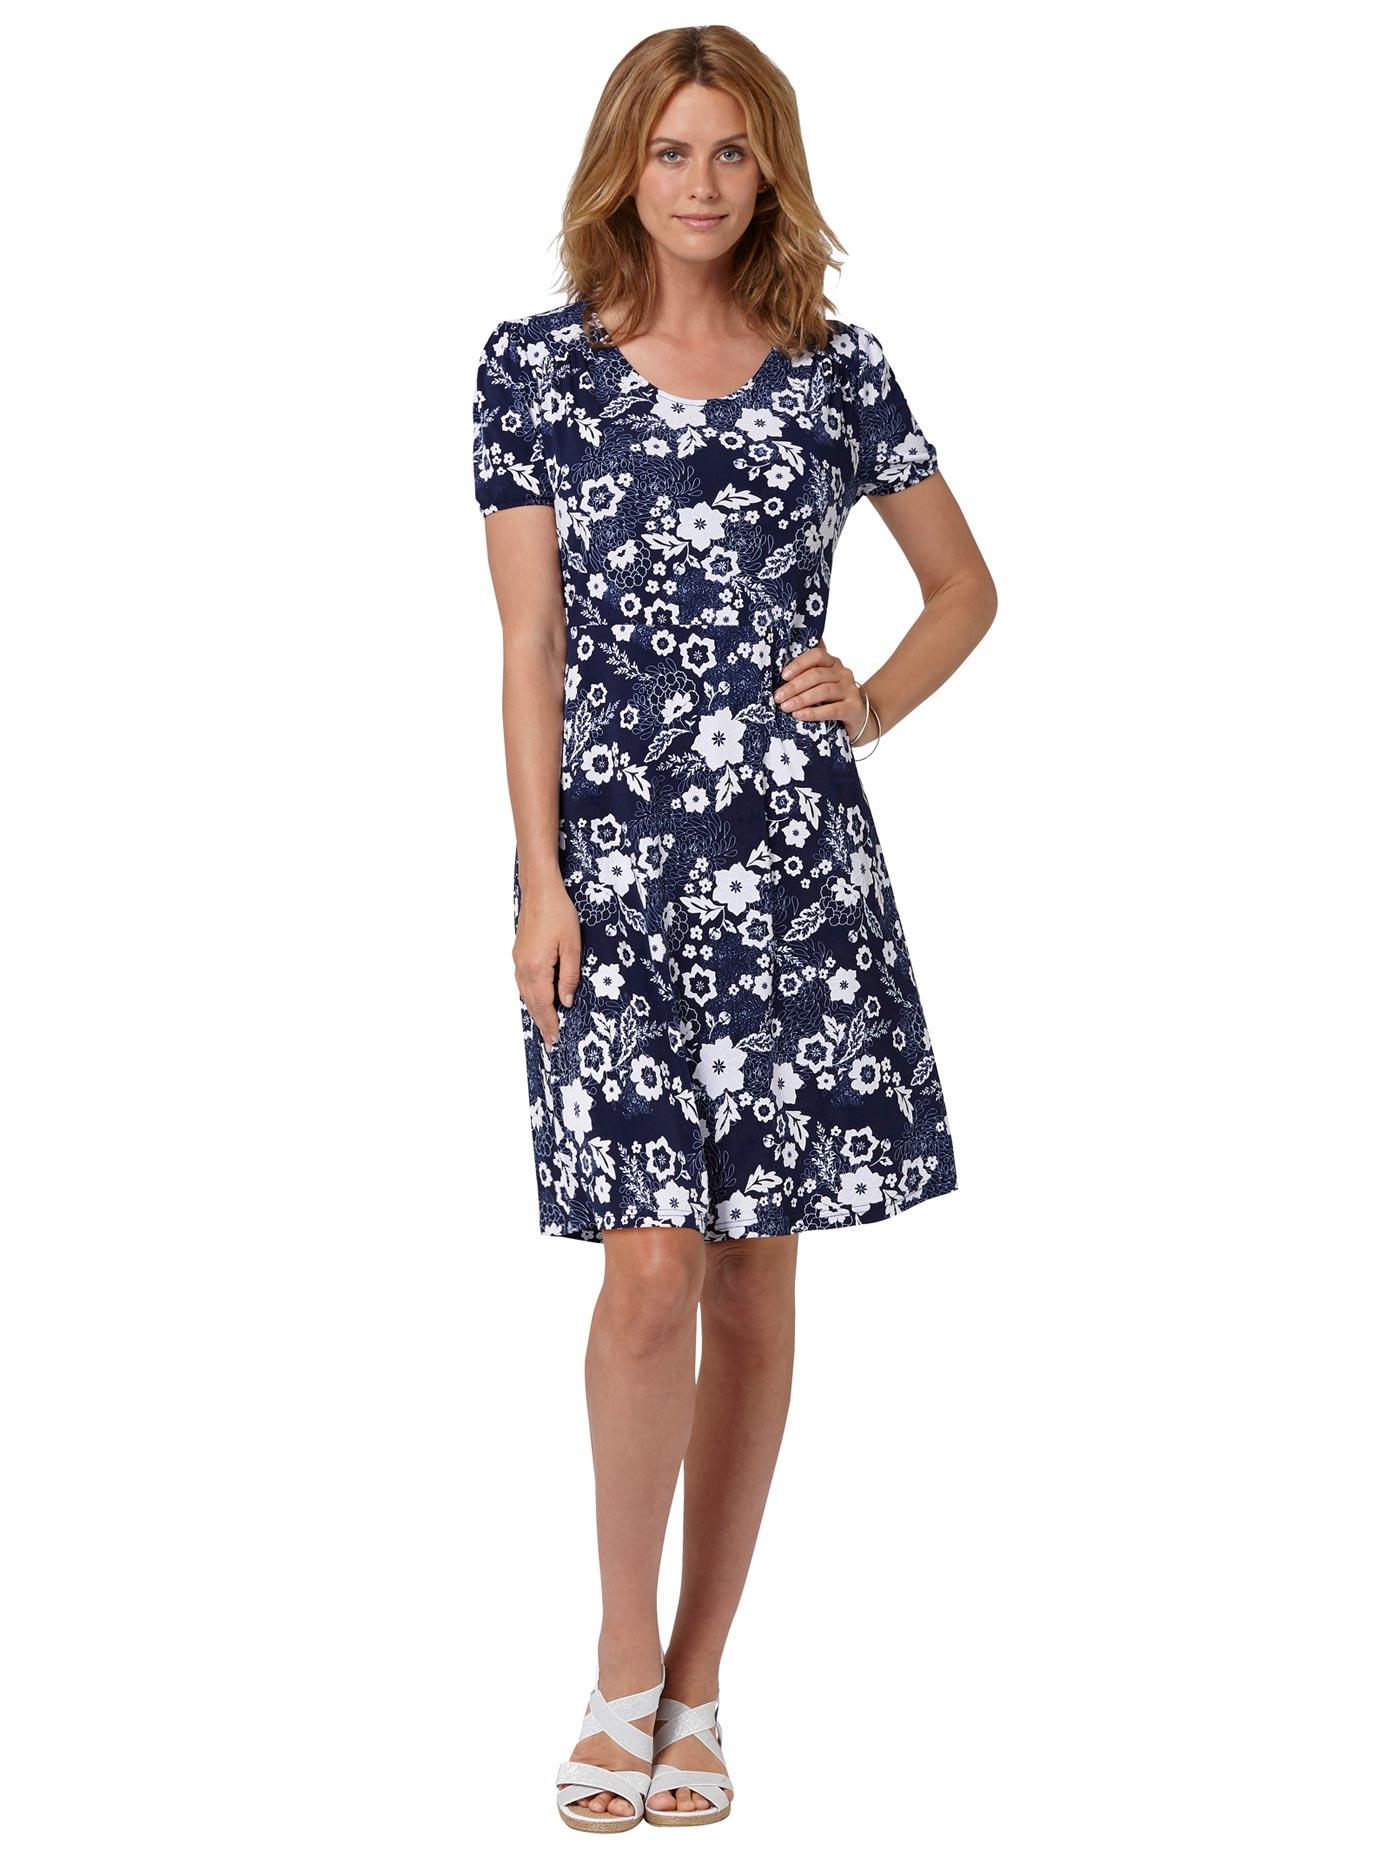 ambria -  Druckkleid Jersey-Kleid